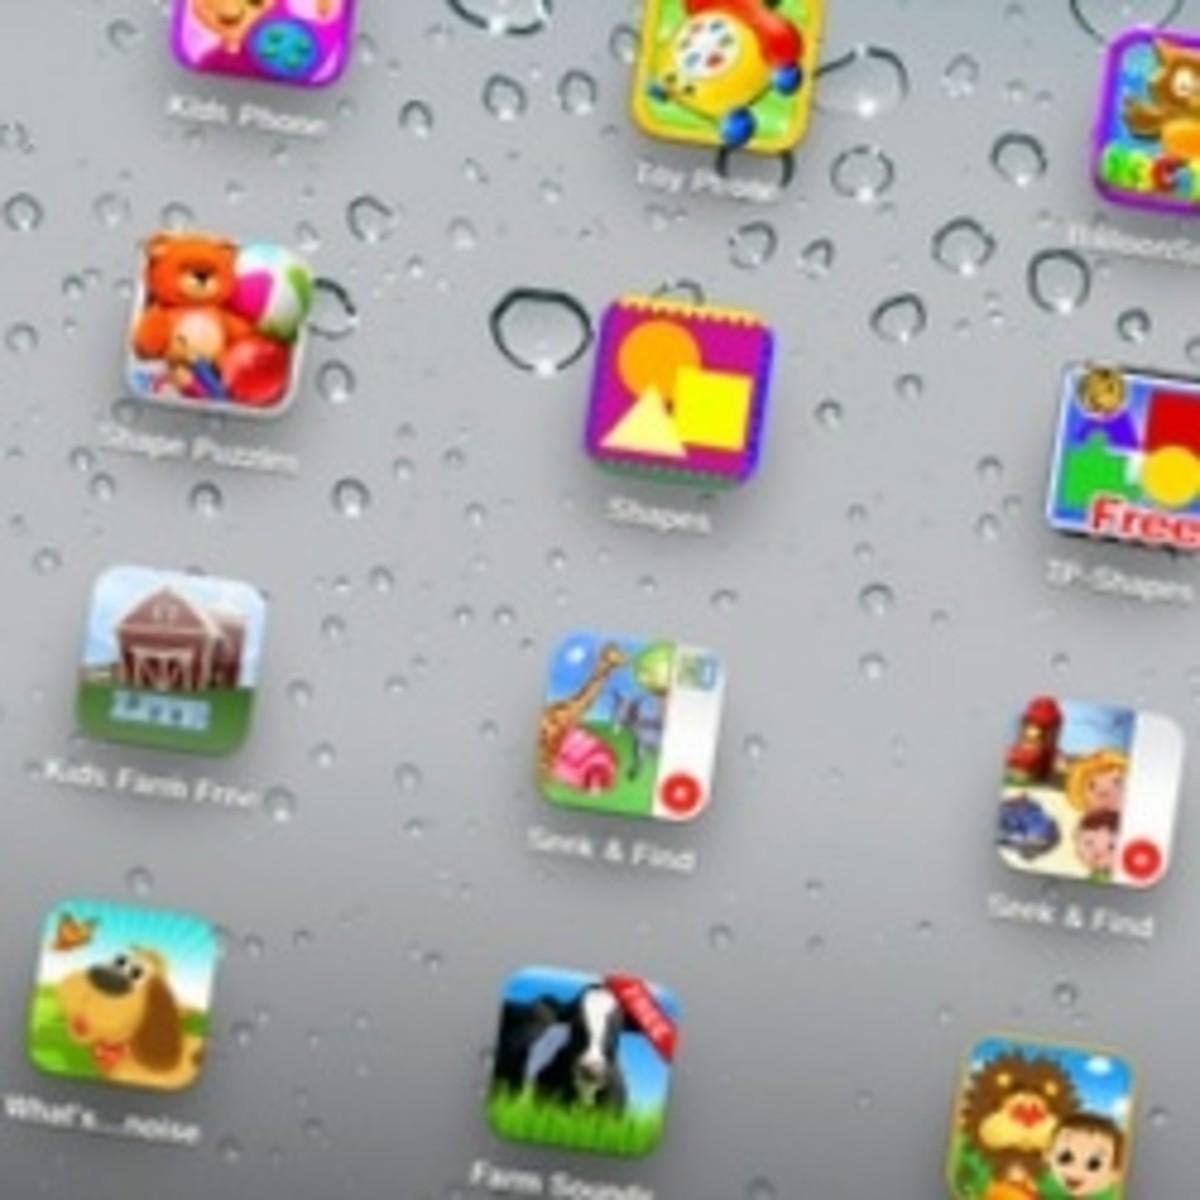 Ten More Free Toddler iPad Apps